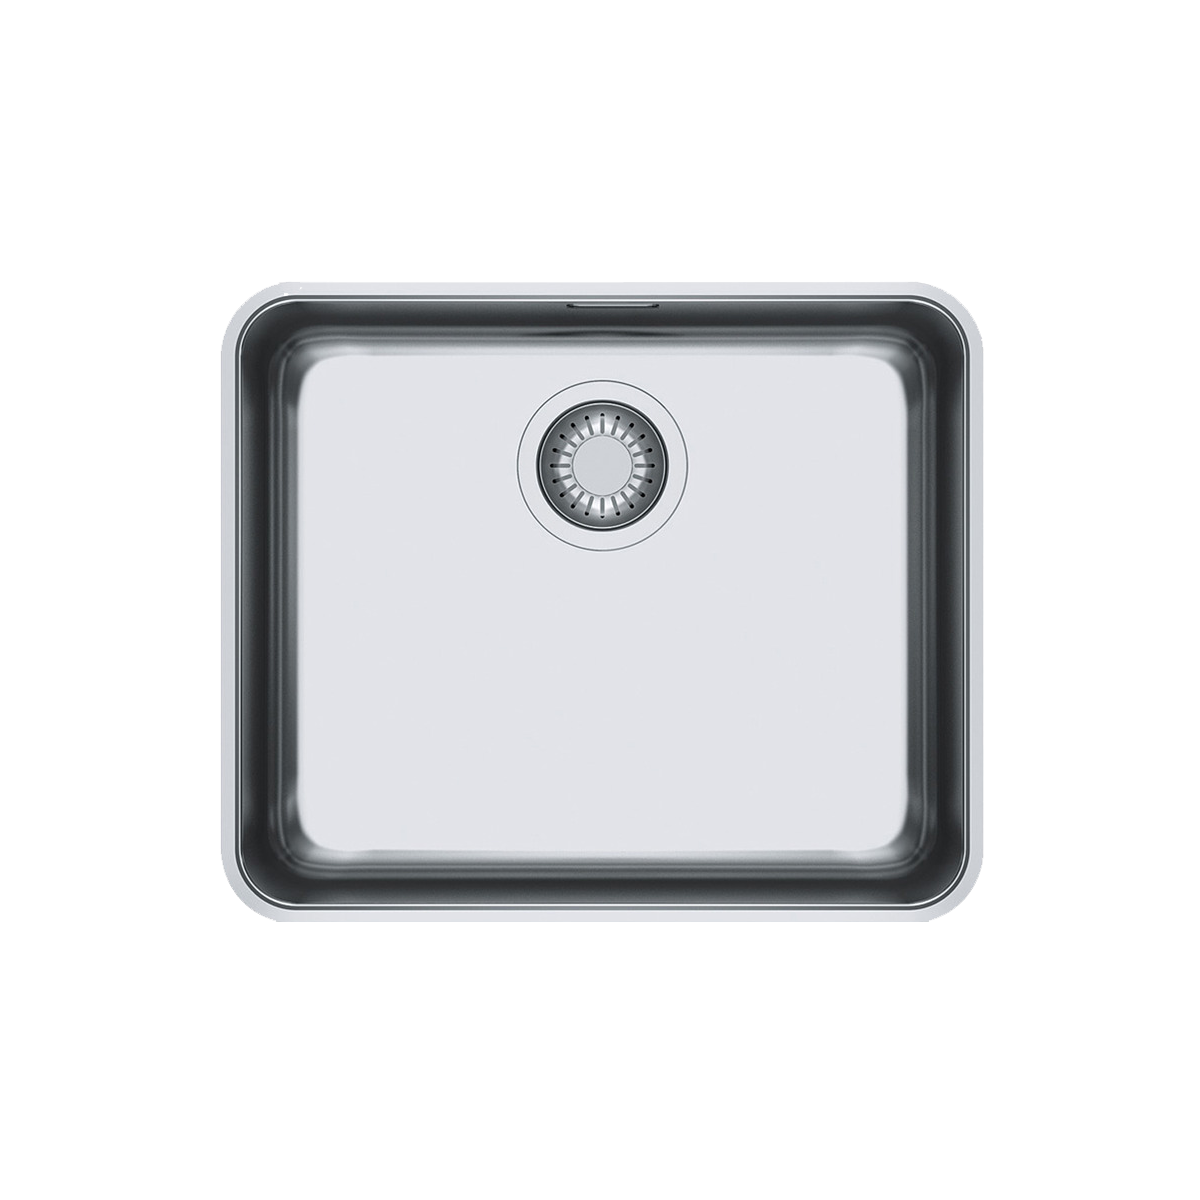 Franke Aton Sink : Franke Aton Related Keywords & Suggestions - Franke Aton Long Tail ...